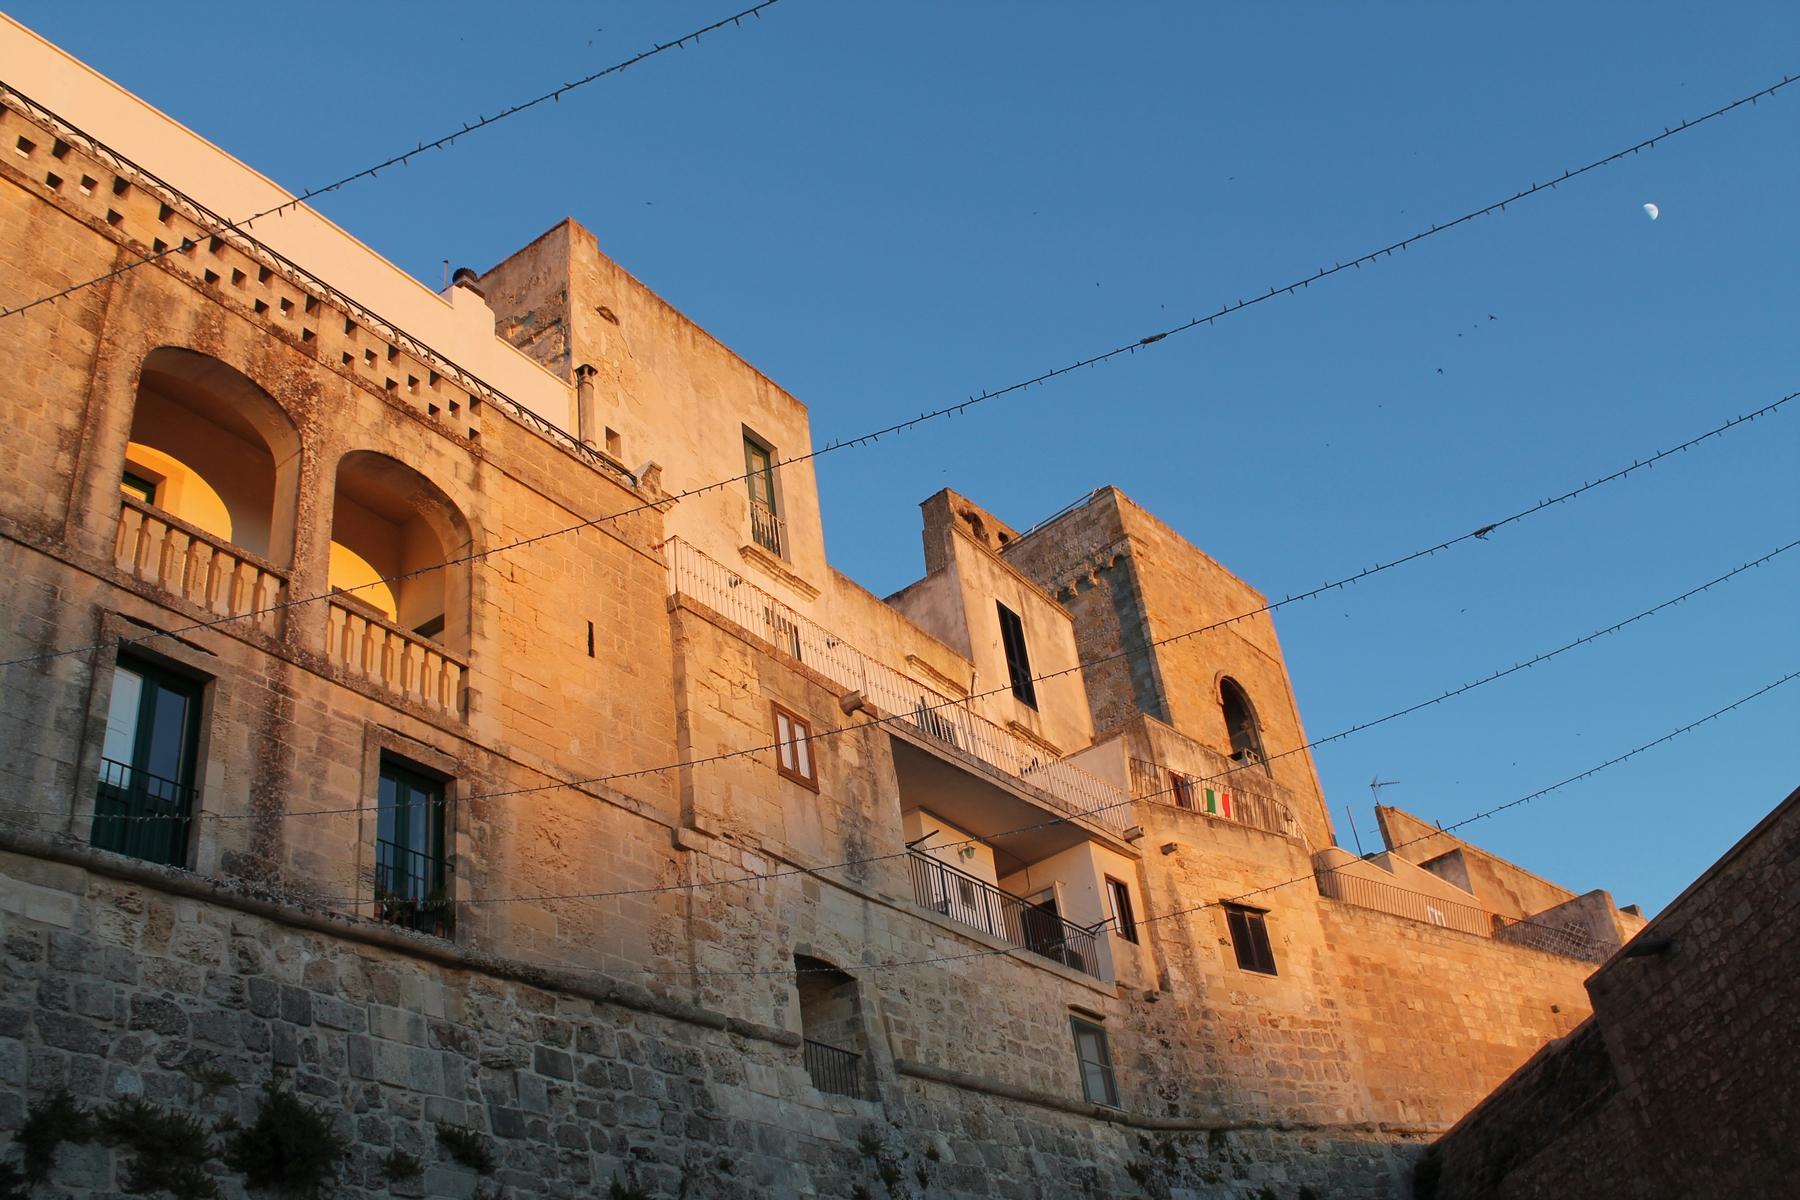 Centro histórico de Otranto